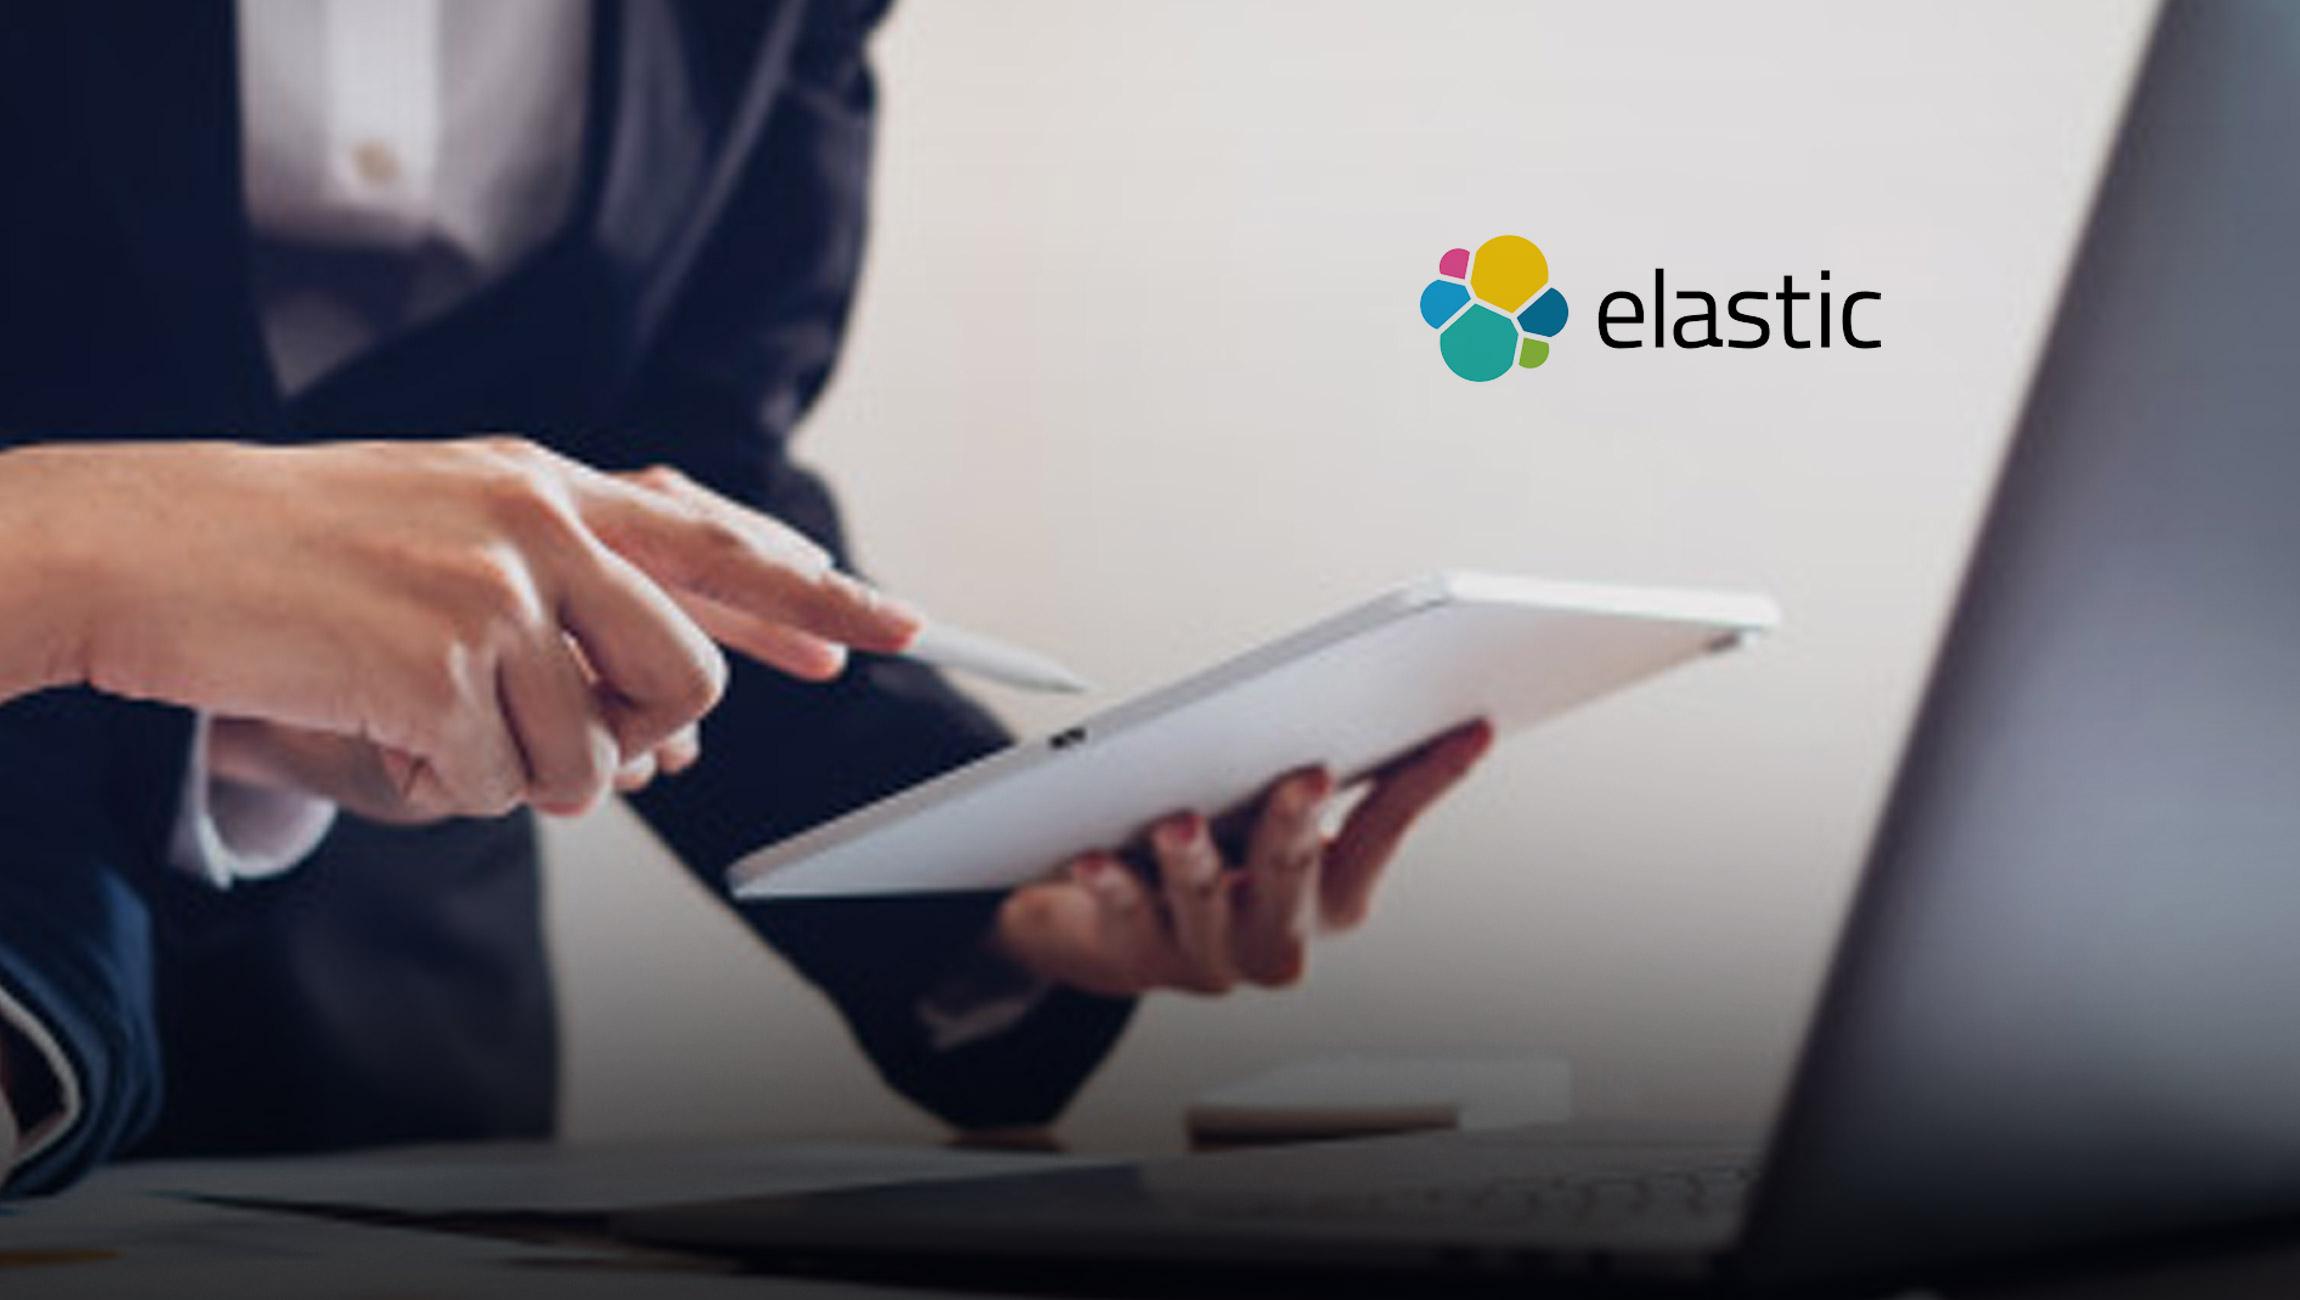 Elastic Launches Enterprise Search on Elastic Cloud